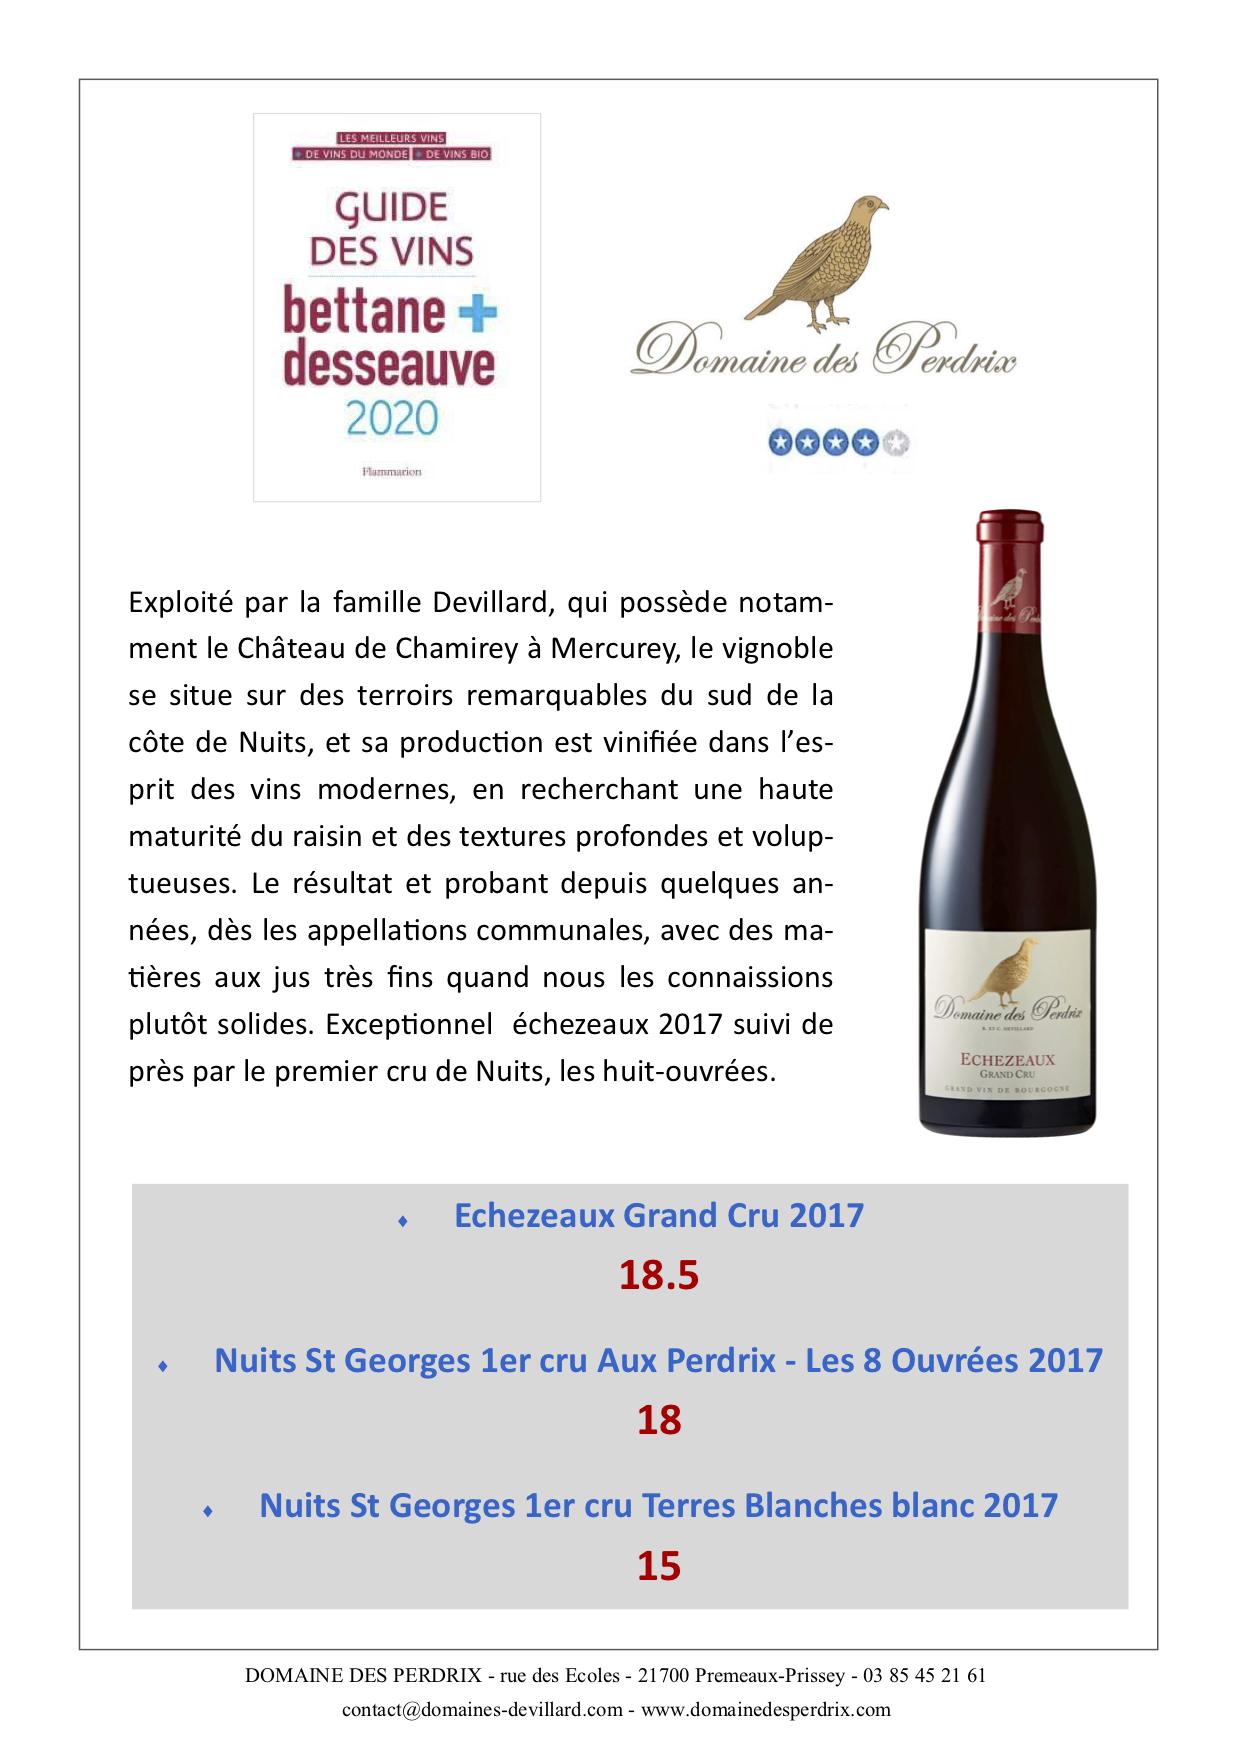 Bettane Desseauve 2020_DDP 2017.png